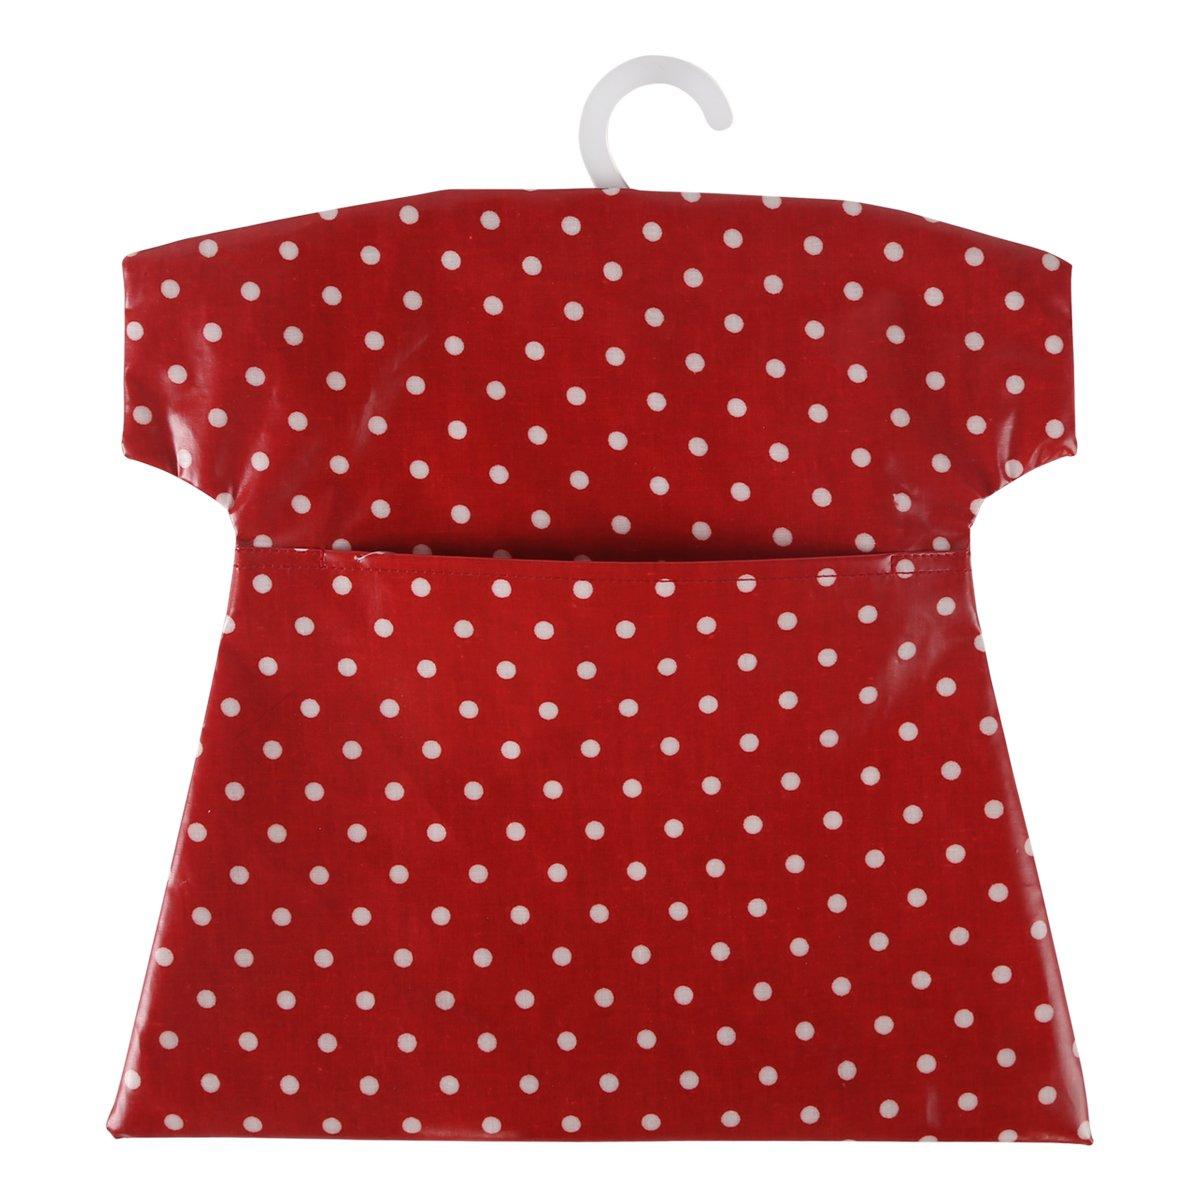 (Polka Dots Wine Red) - Neoviva Waterproof Clothespin Peg Bag with Plastic Hanger, Polka Dot Wine Red B00LXOVF1K Polka Dot Wine Red